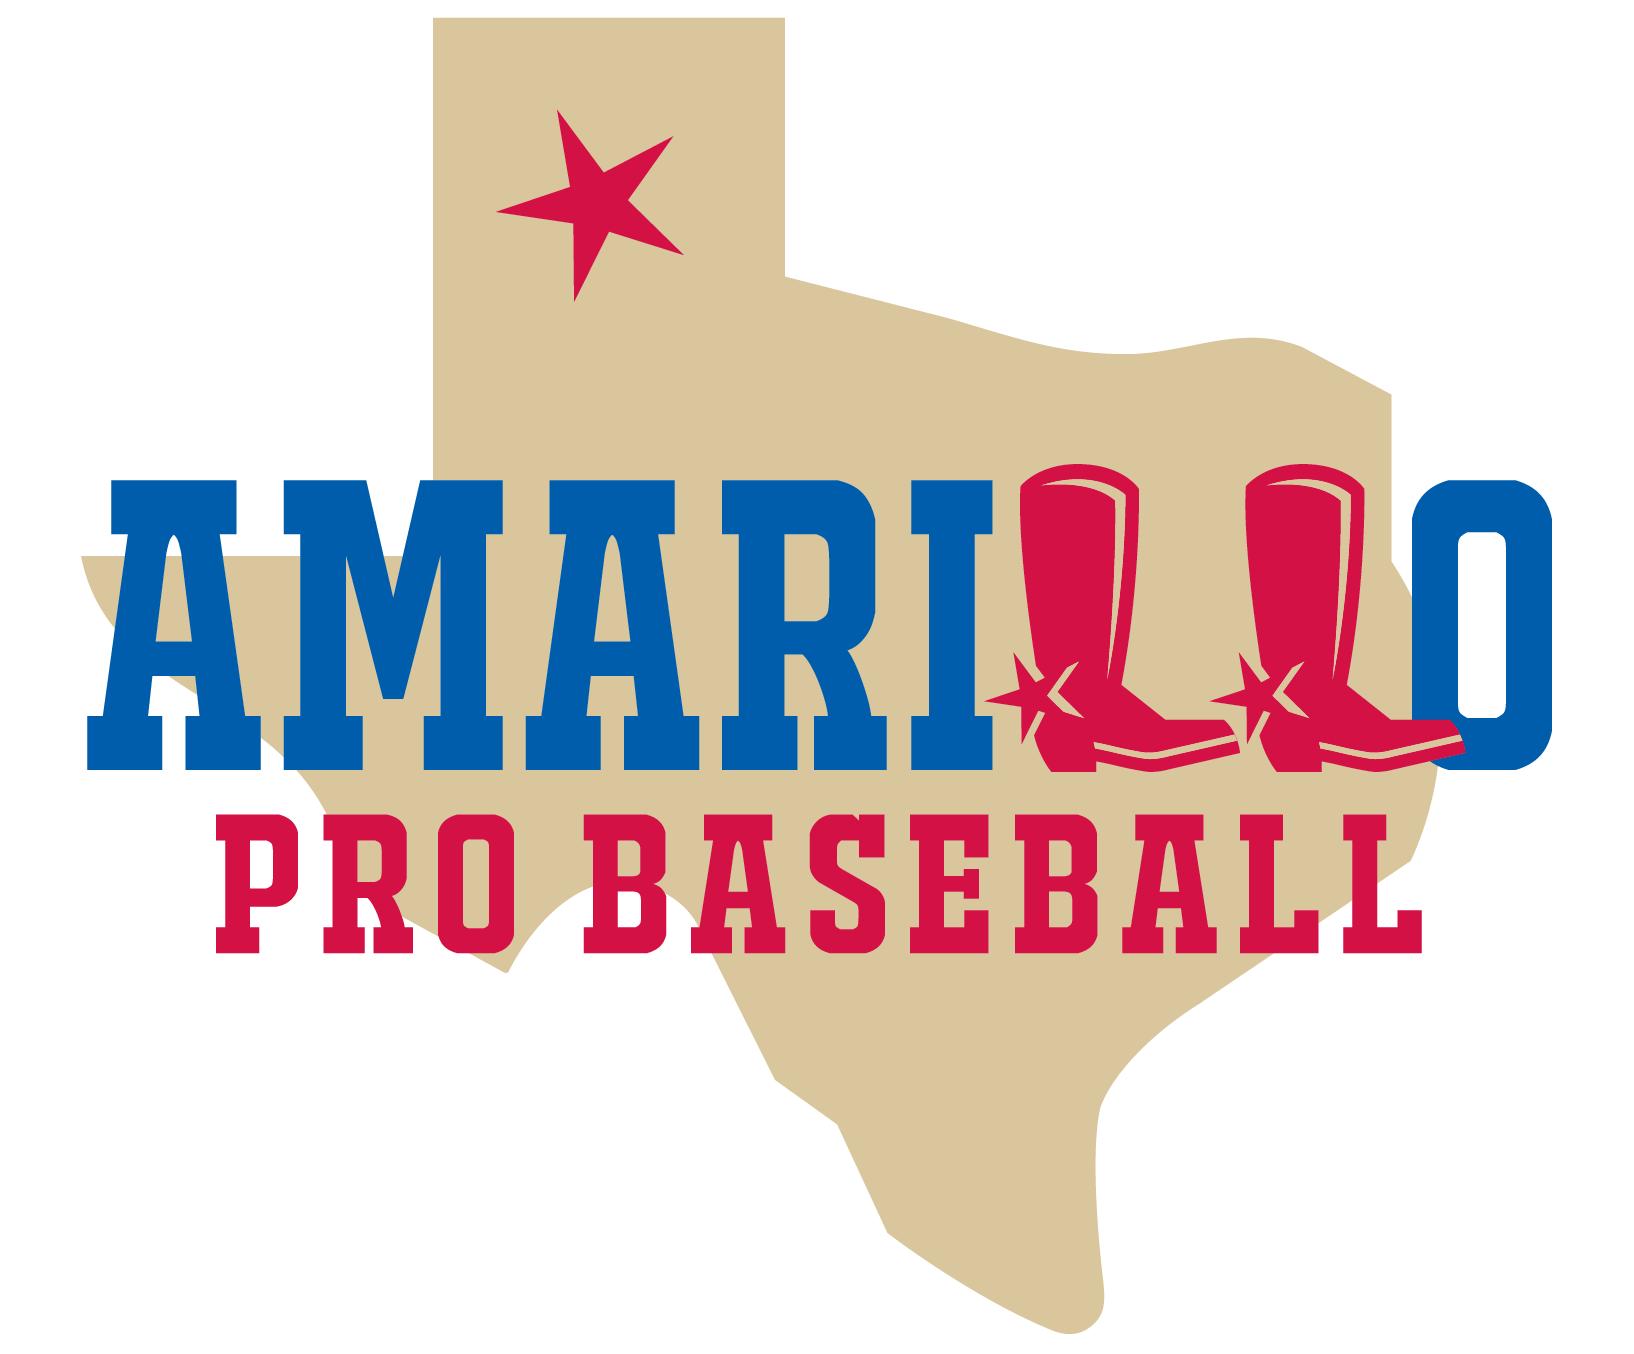 Amarillo-1-IntroResearch_InterimLogo-1.png